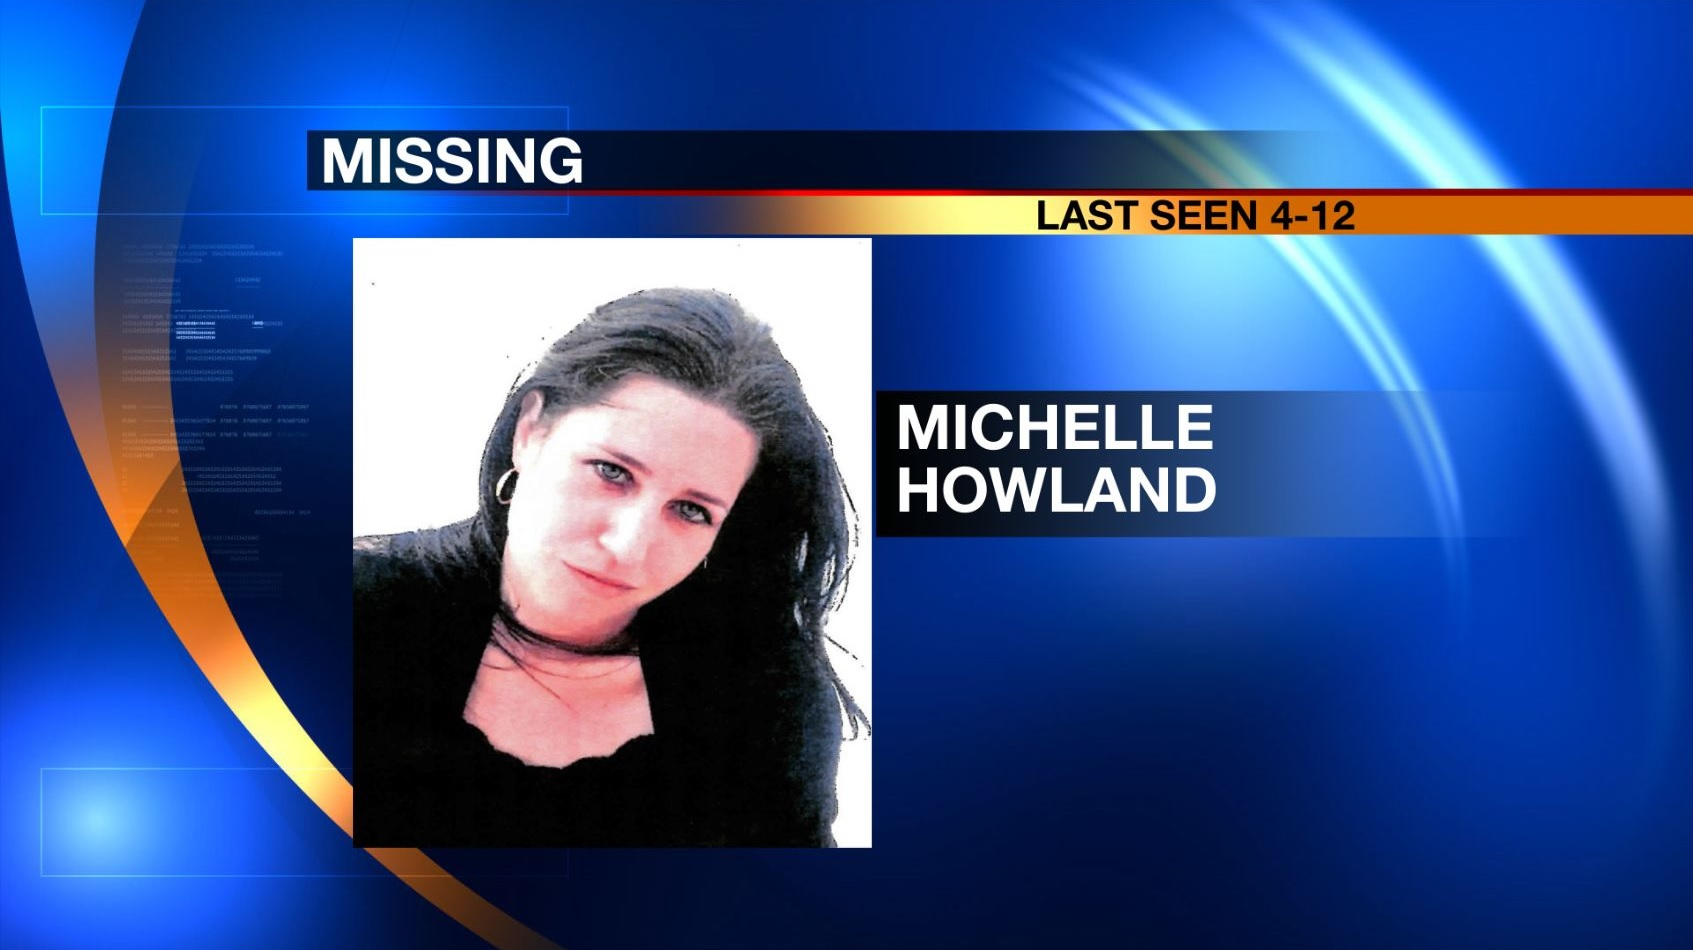 missingwoman_1492113774714.jpg